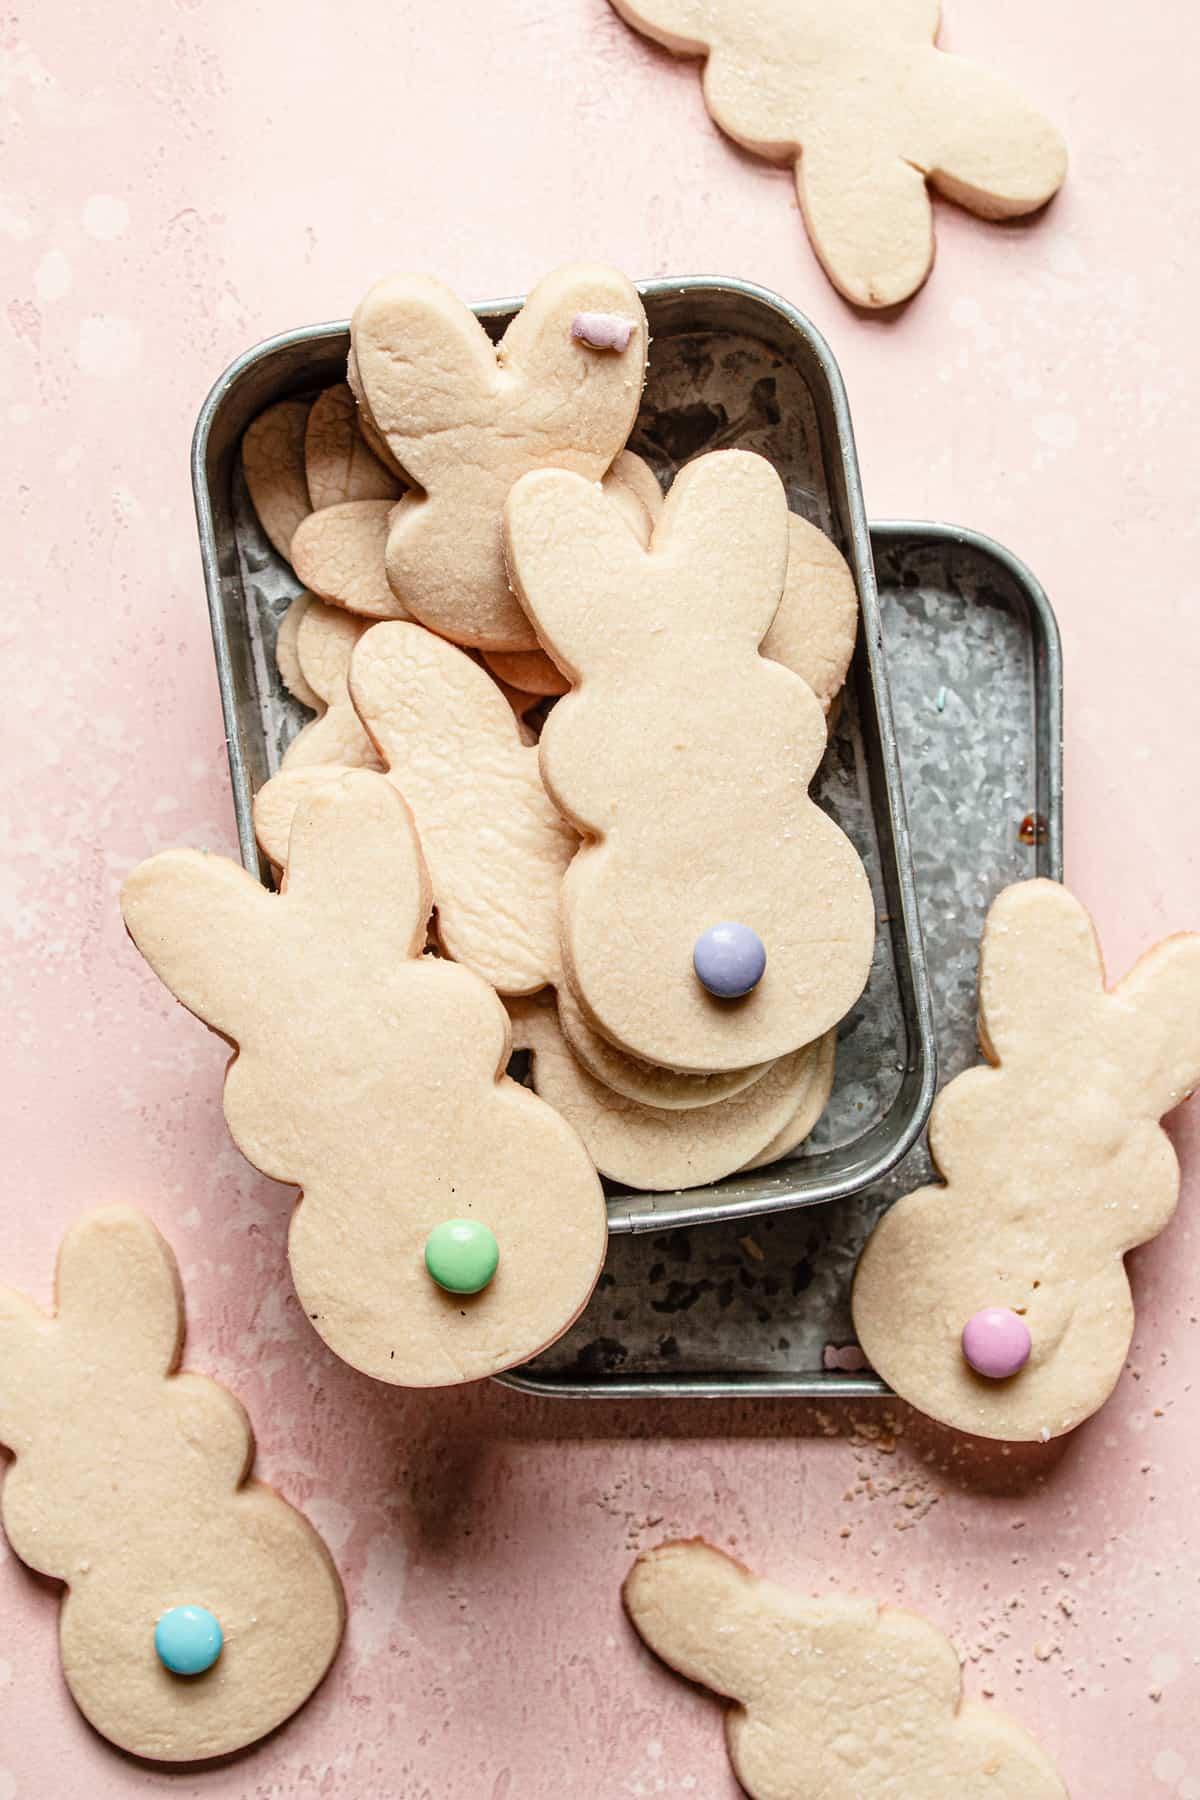 Easter bunny shortbread cookies recipe